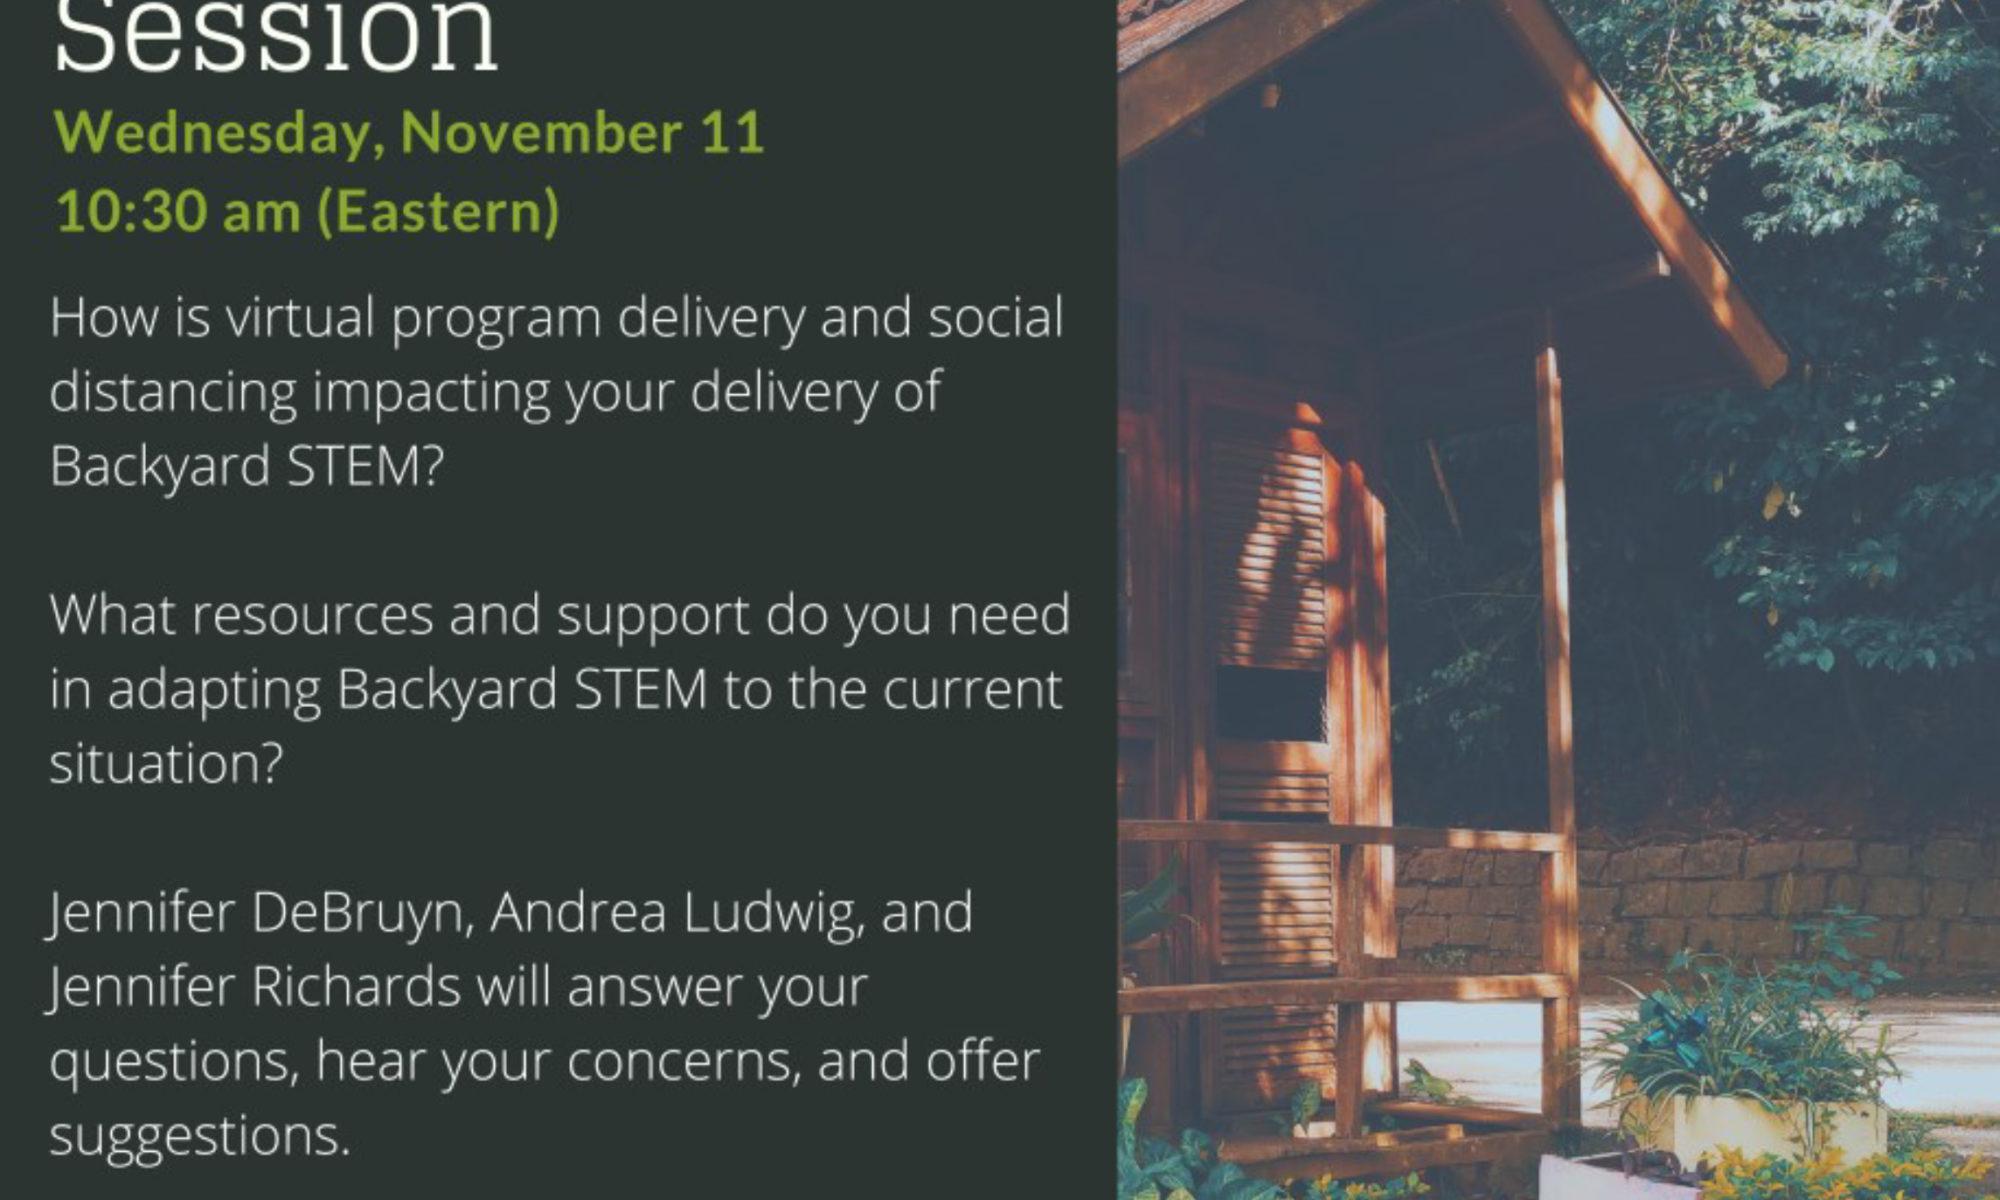 Backyard STEM - 4-H Listening Session